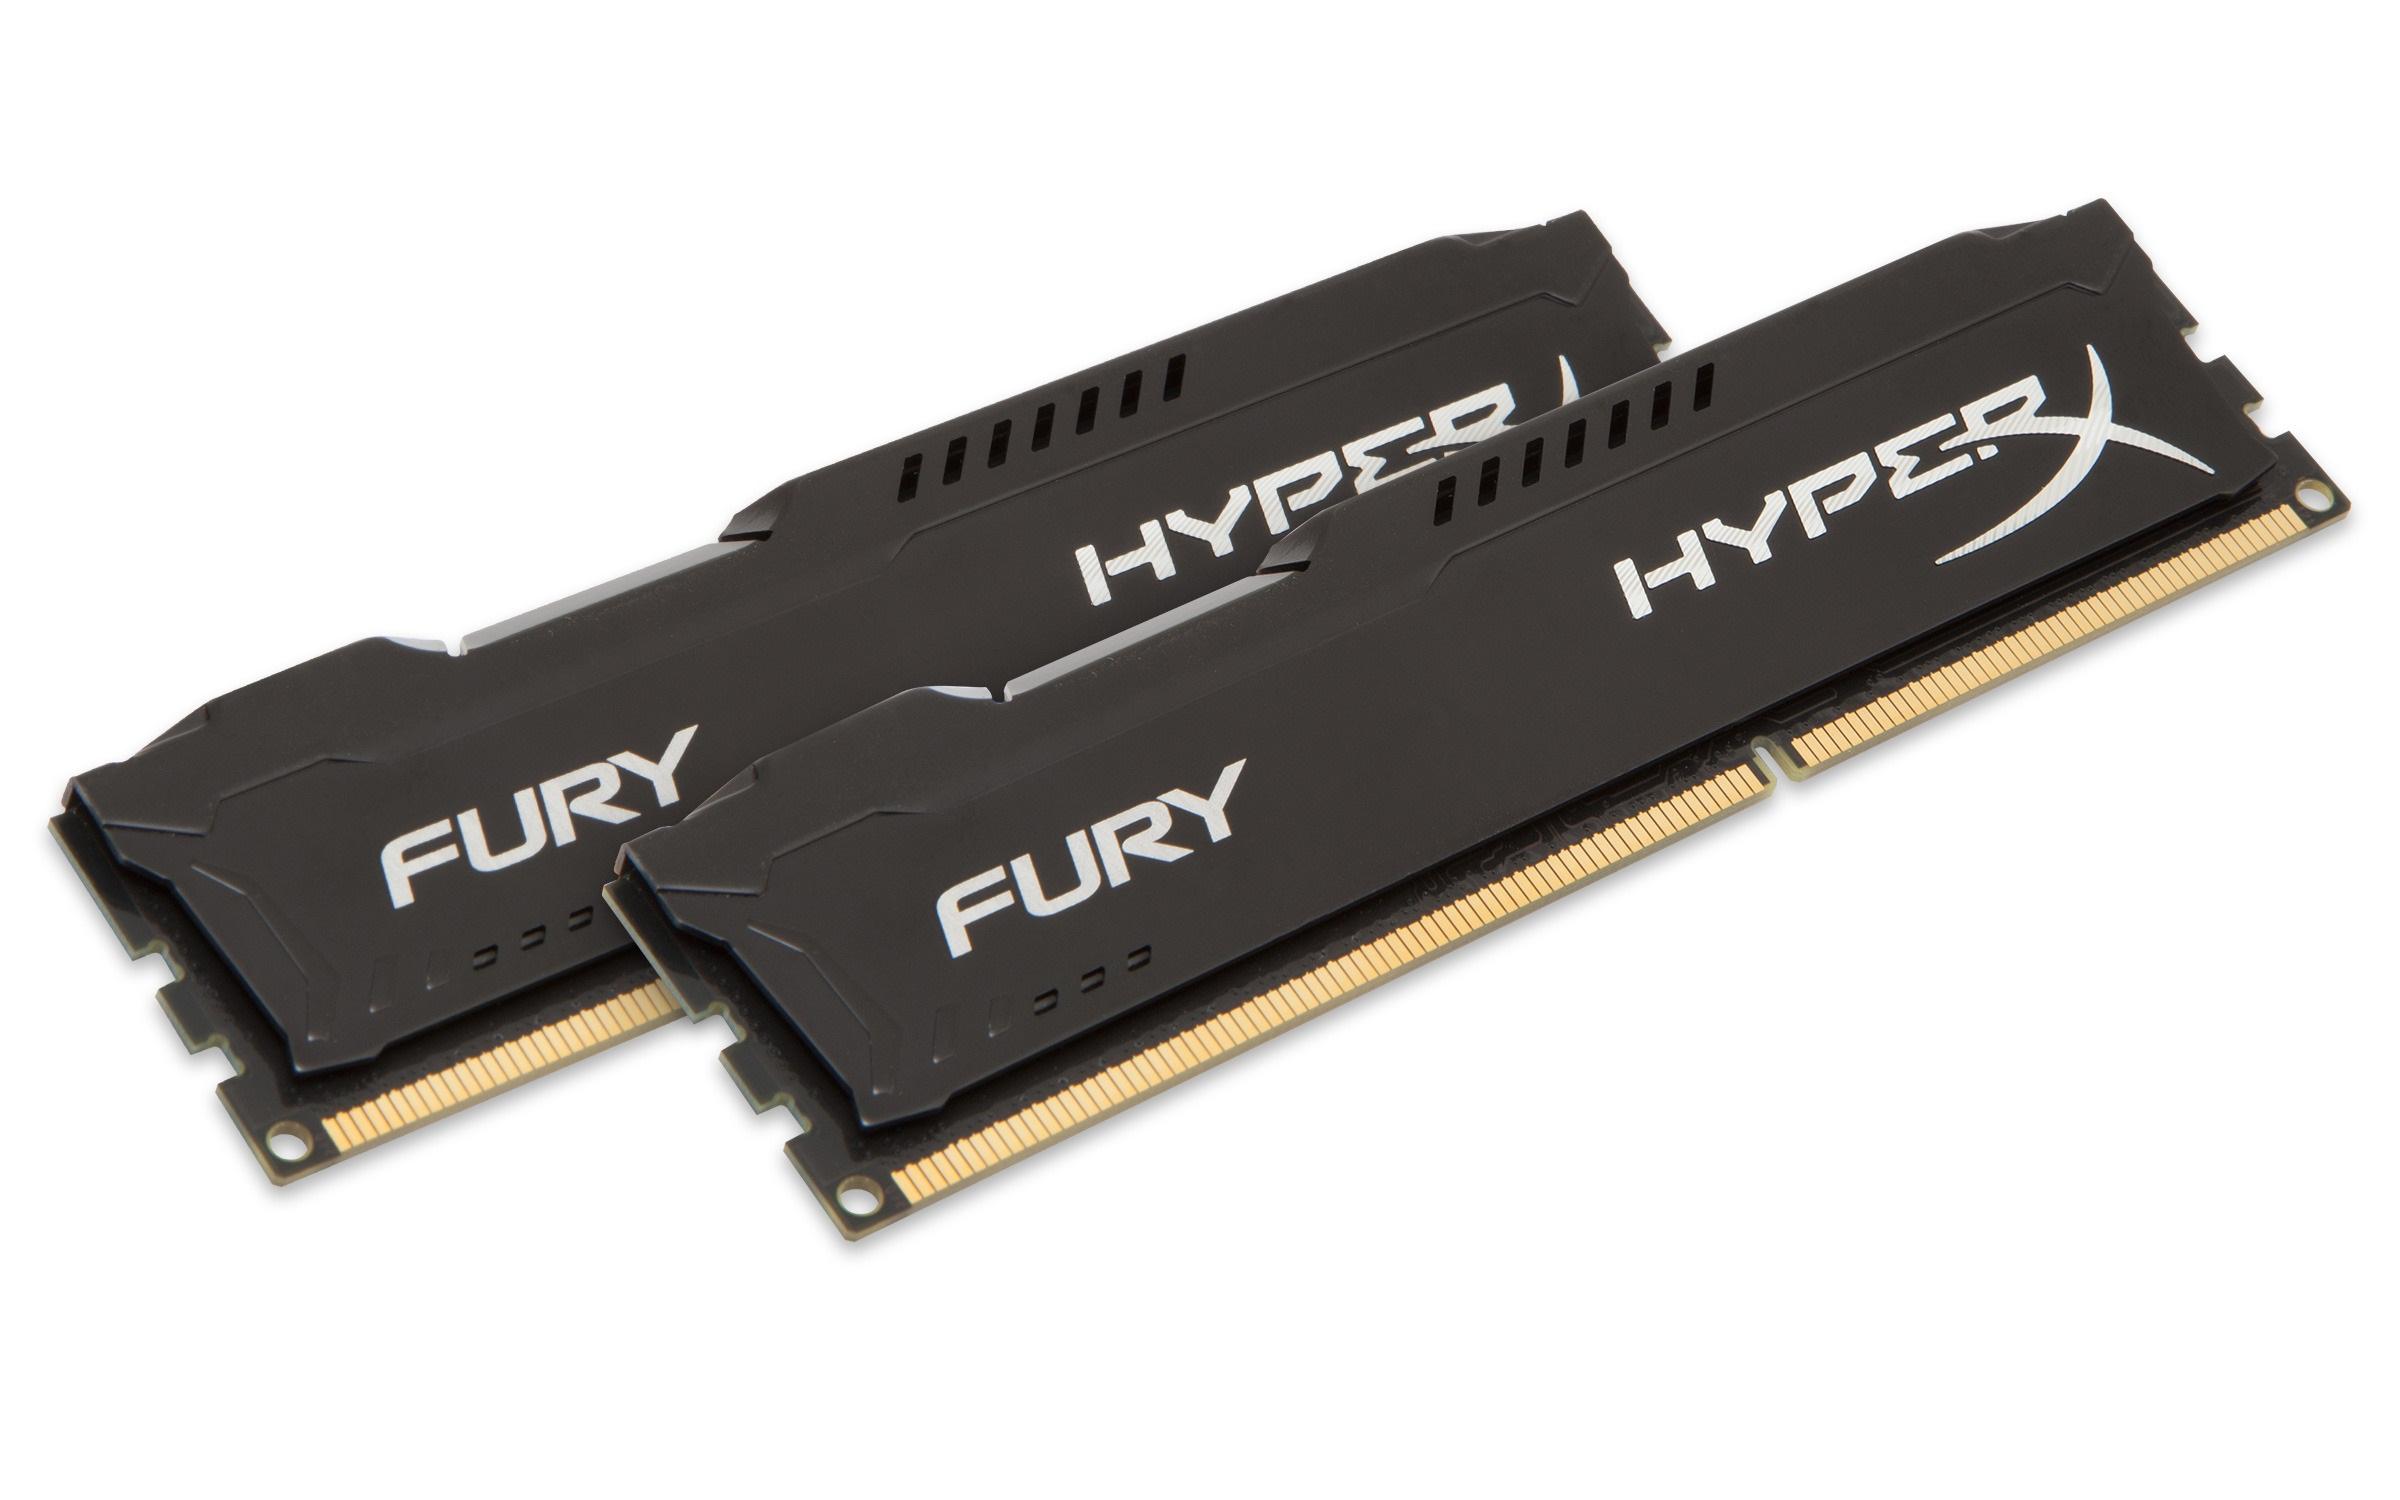 16GB DDR3-1333MHz Kingston HyperX Fury Black,2x8GB